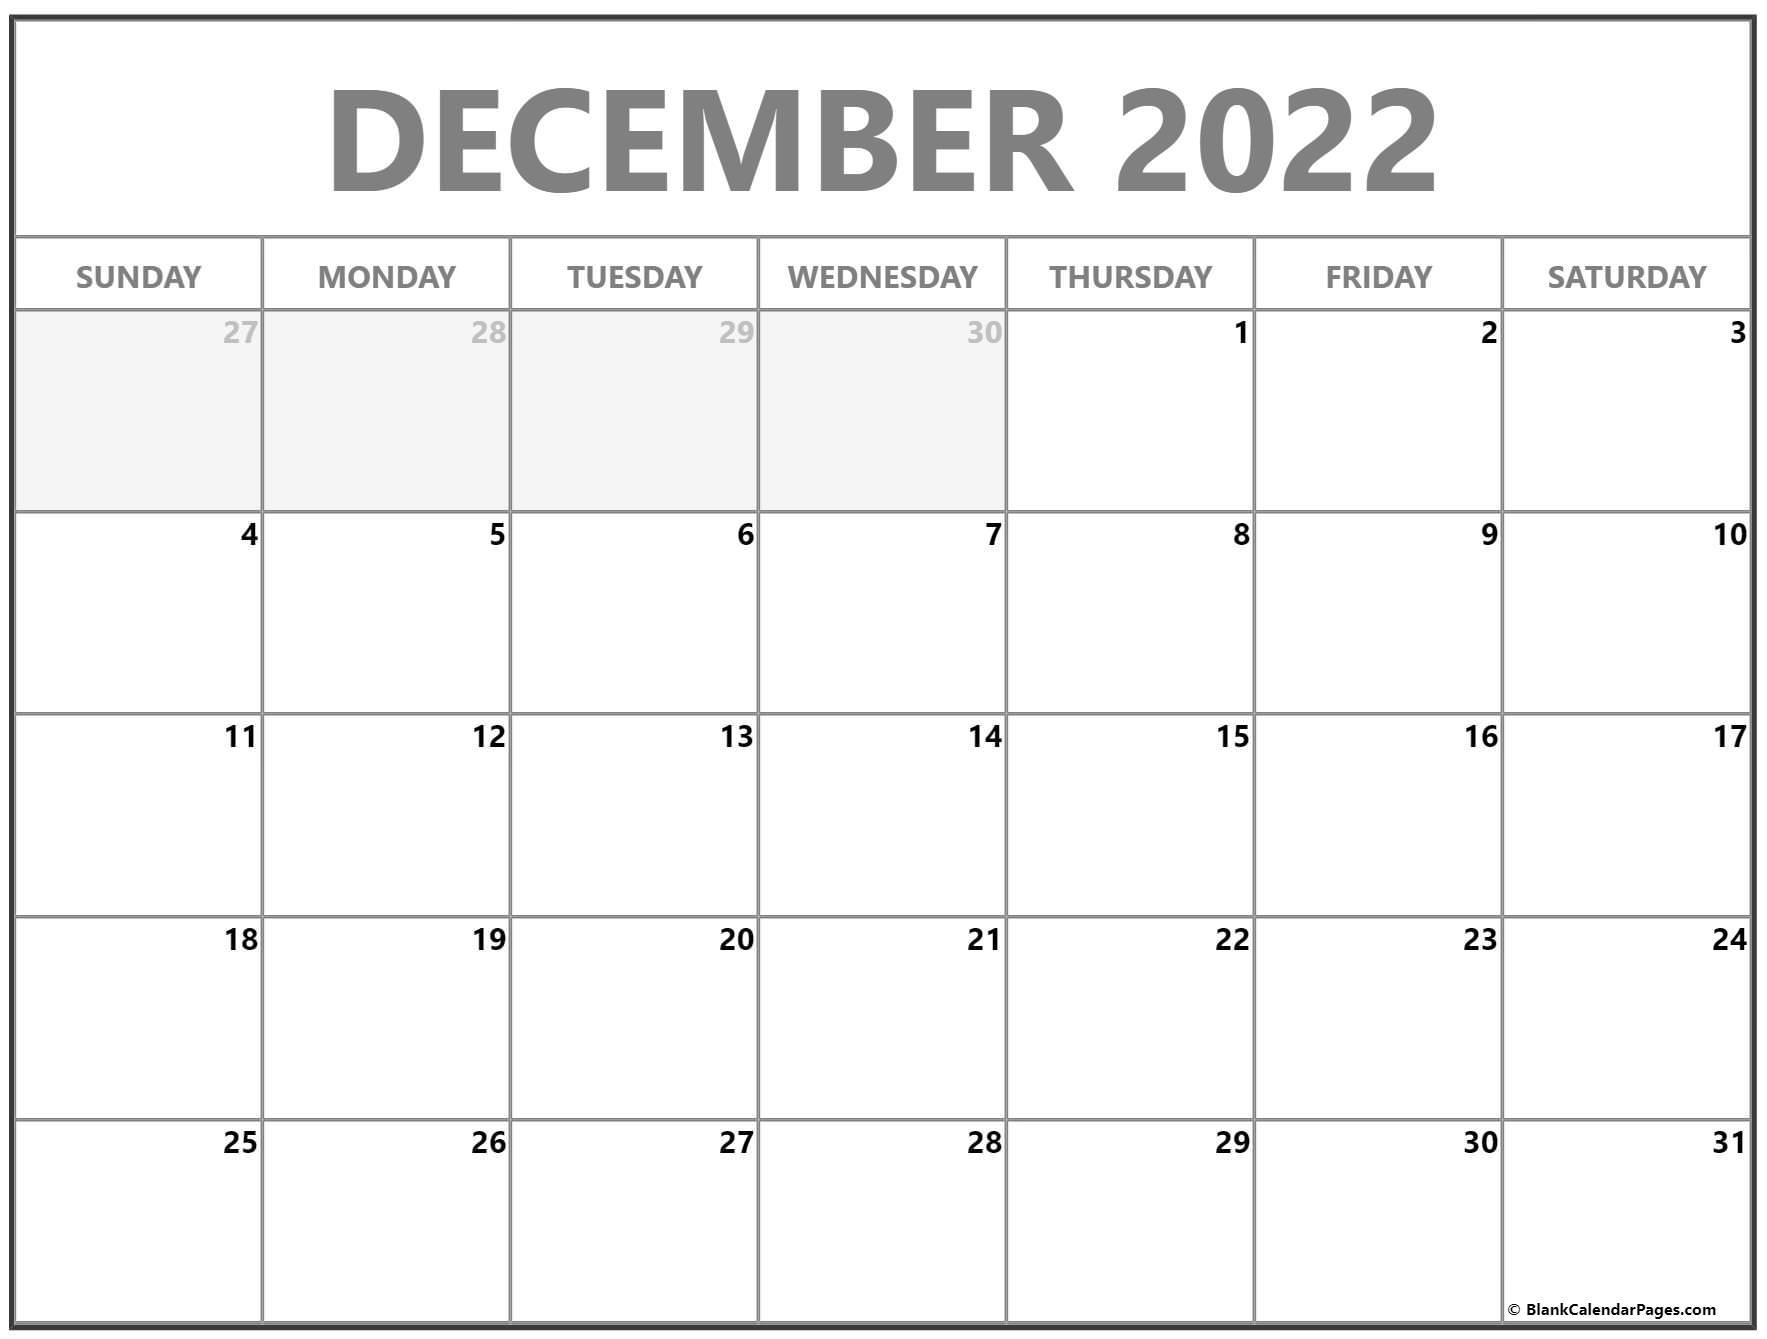 December 2022 calendar | free printable monthly calendars